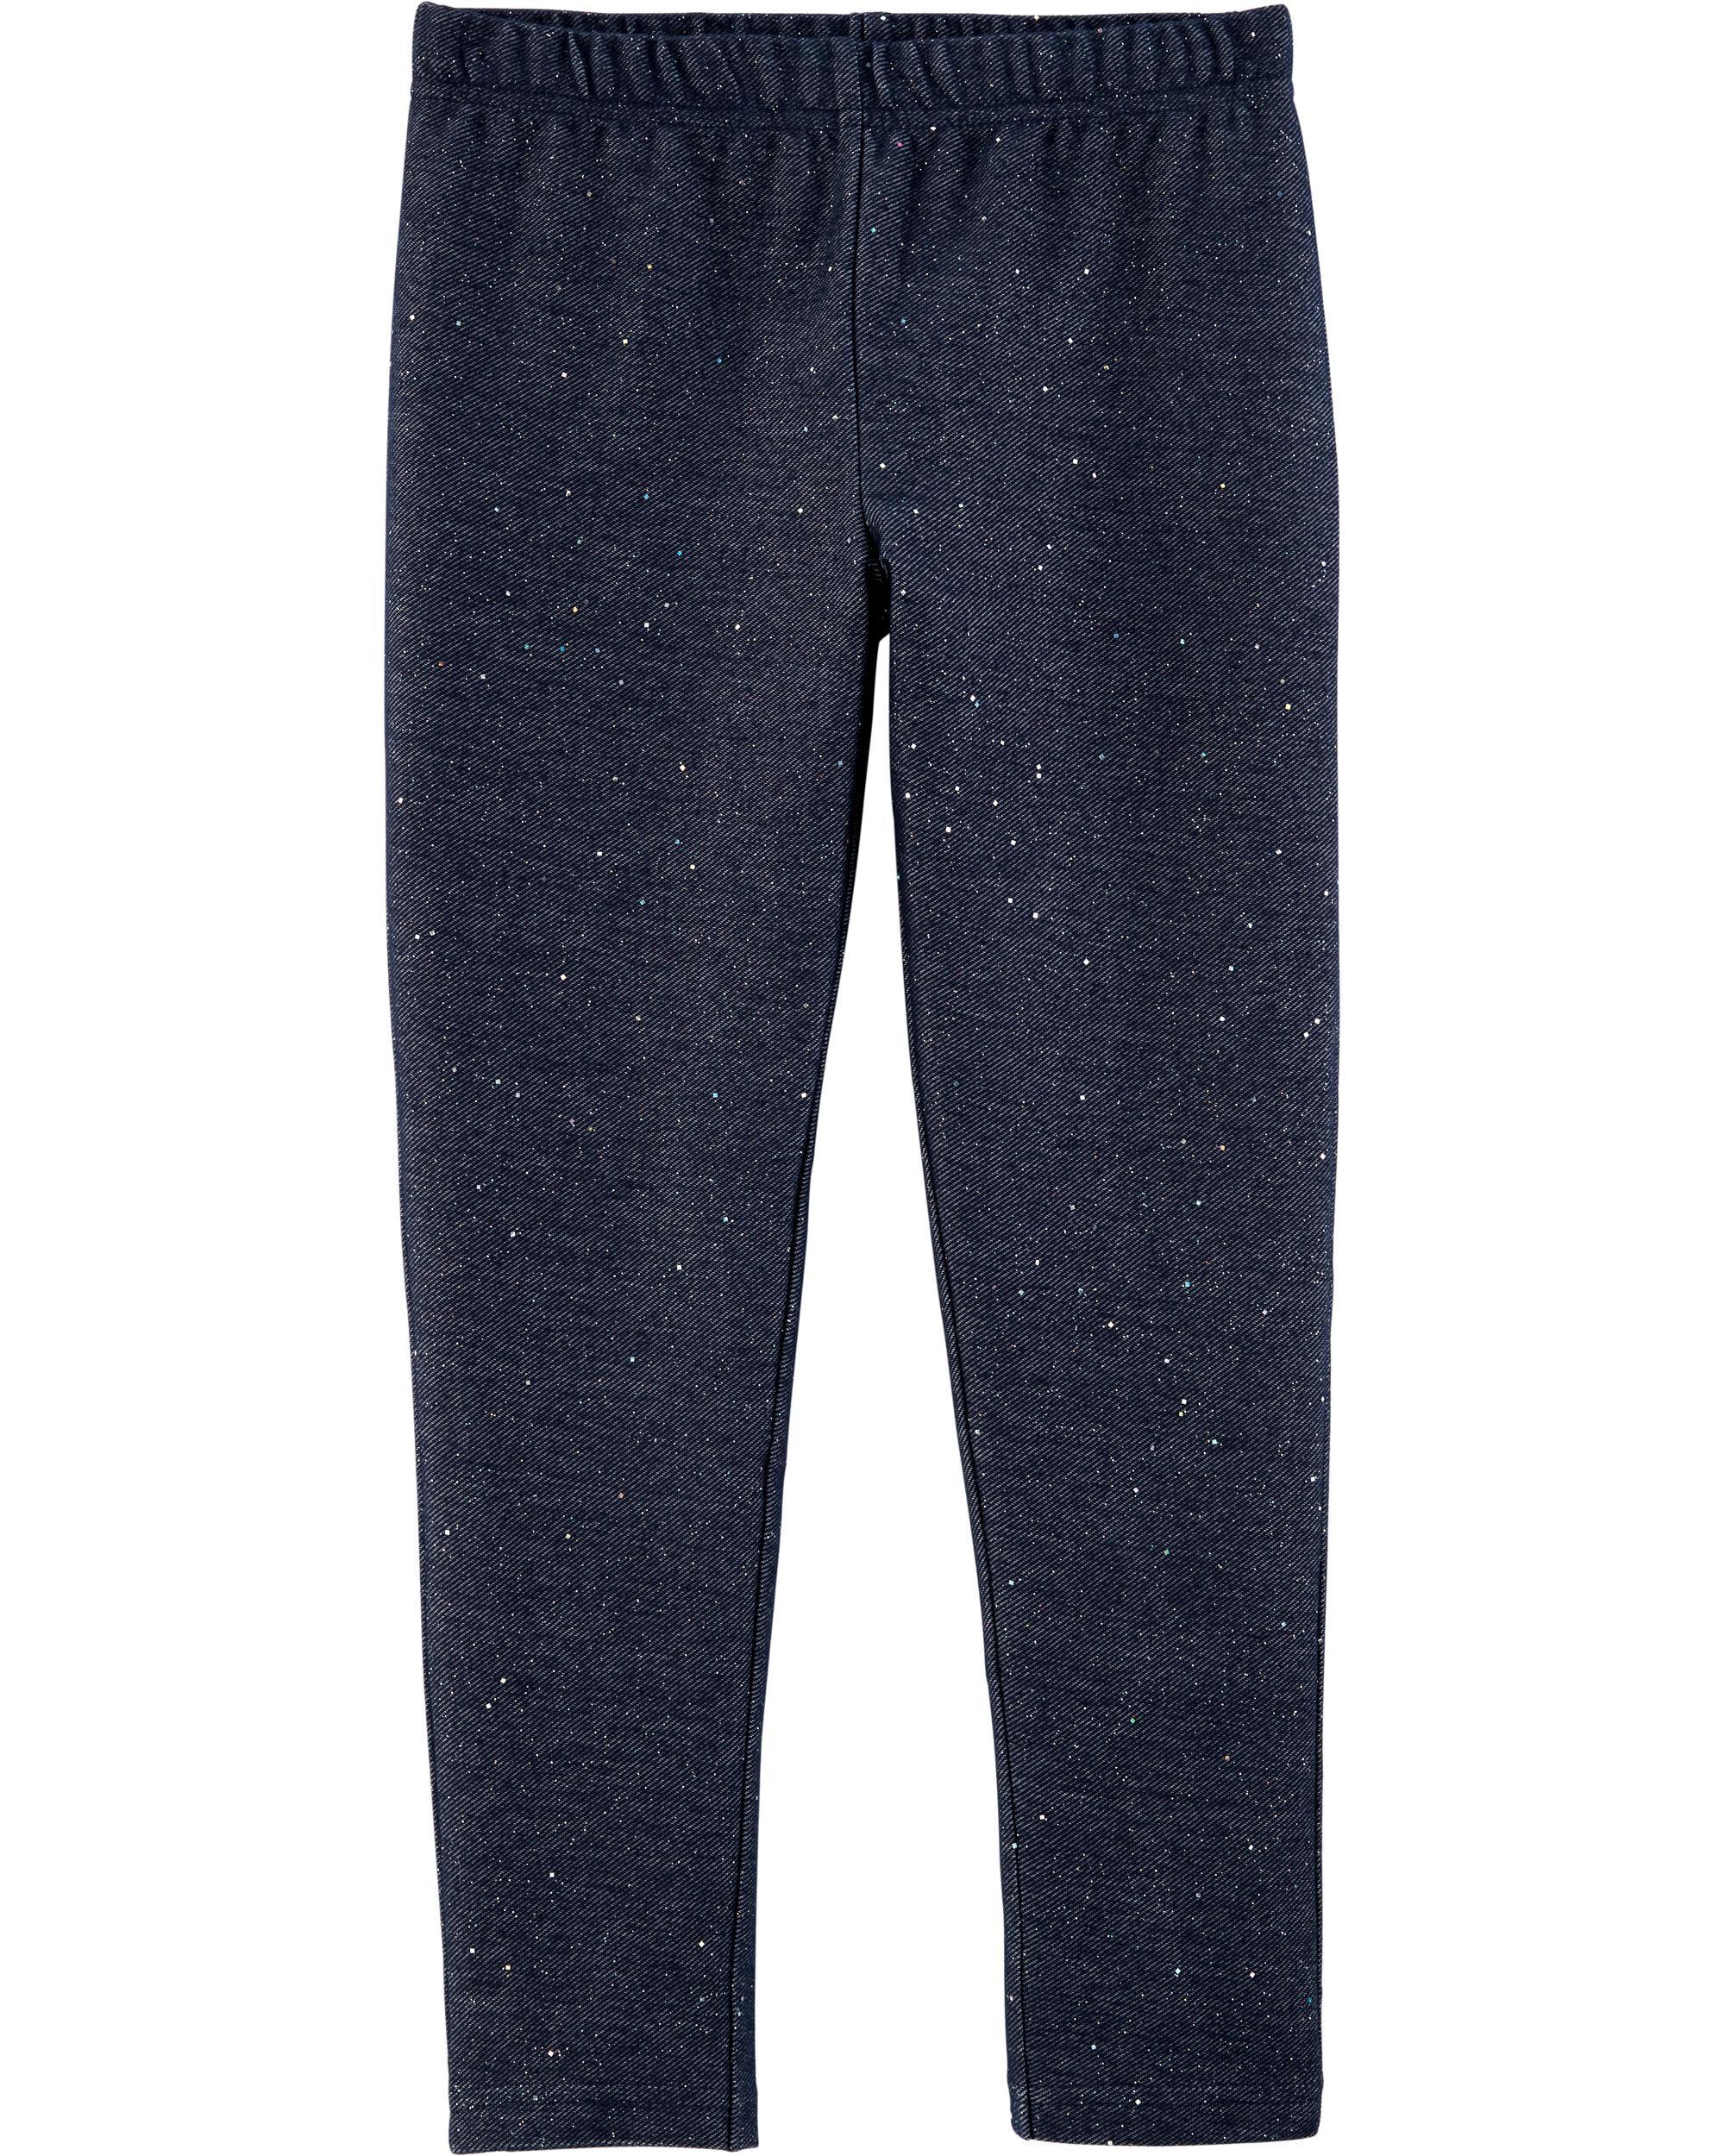 *CLEARANCE* Sparkly Knit Denim Leggings